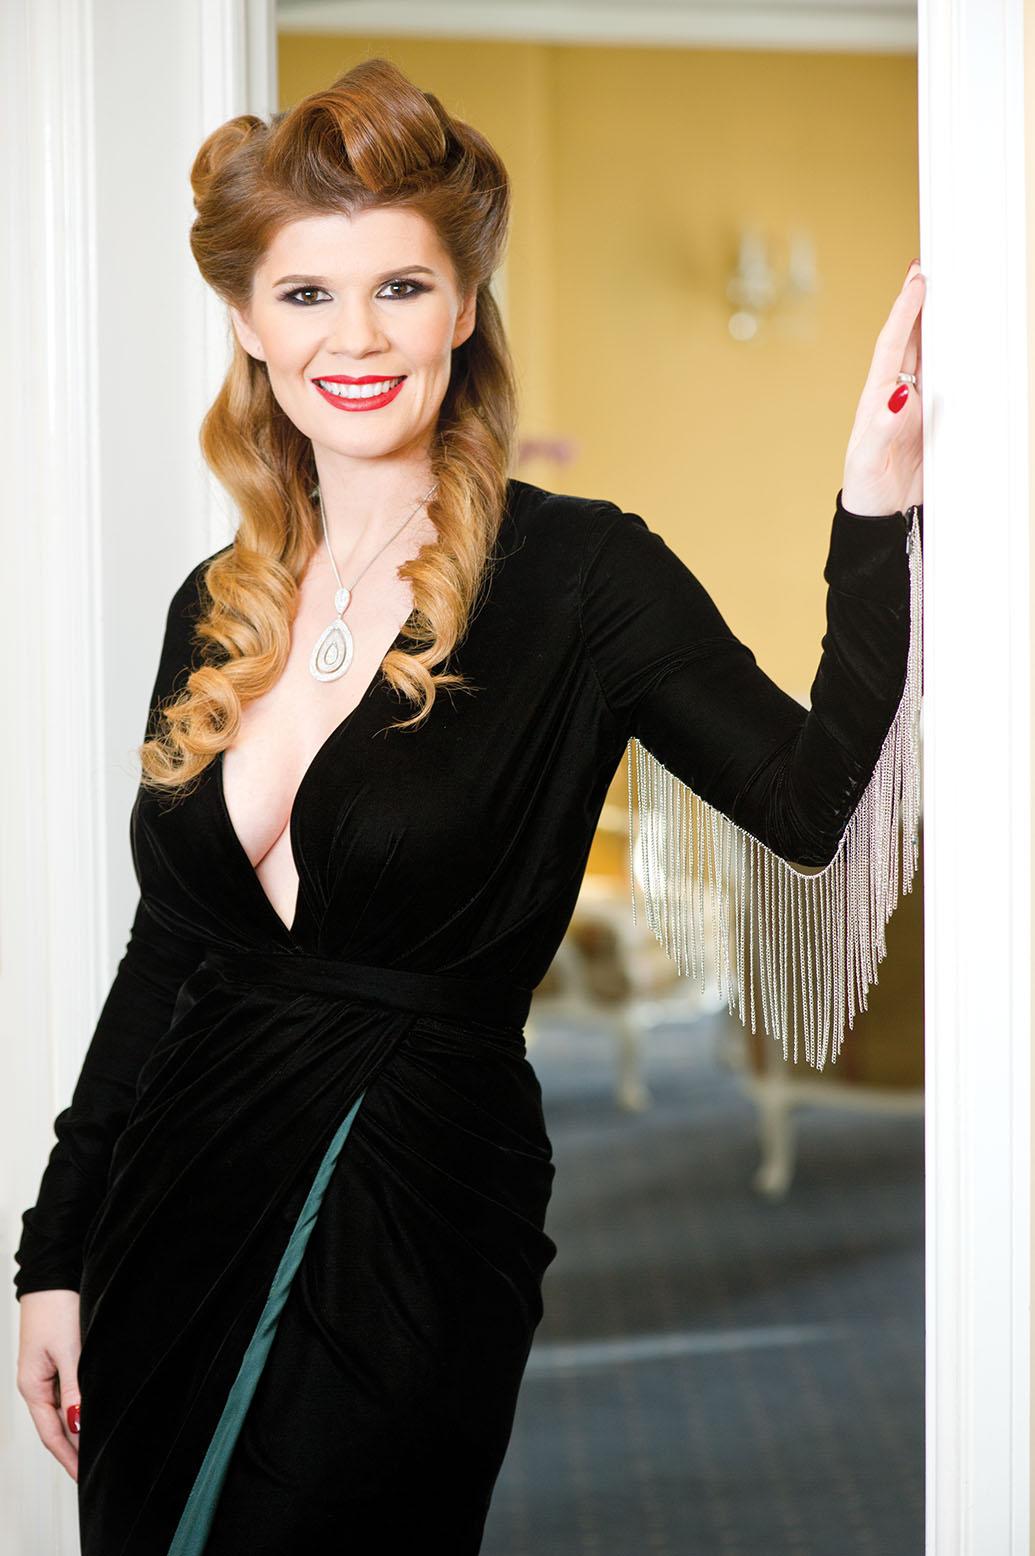 Pictorial si interviu cu Diana Matei pentru Marea Dragoste-revistatango.ro, nr. 116, februarie 2016